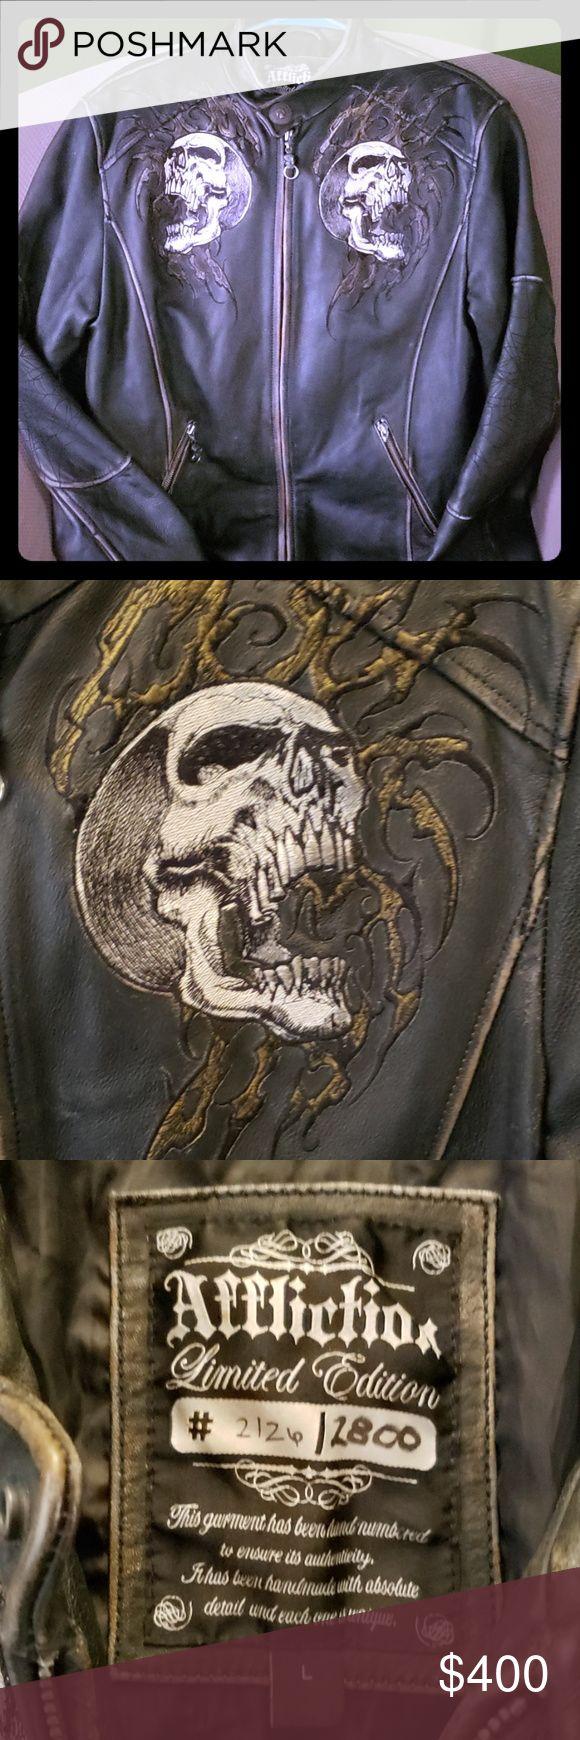 Affliction limited run mens jacket Mens leather jacket